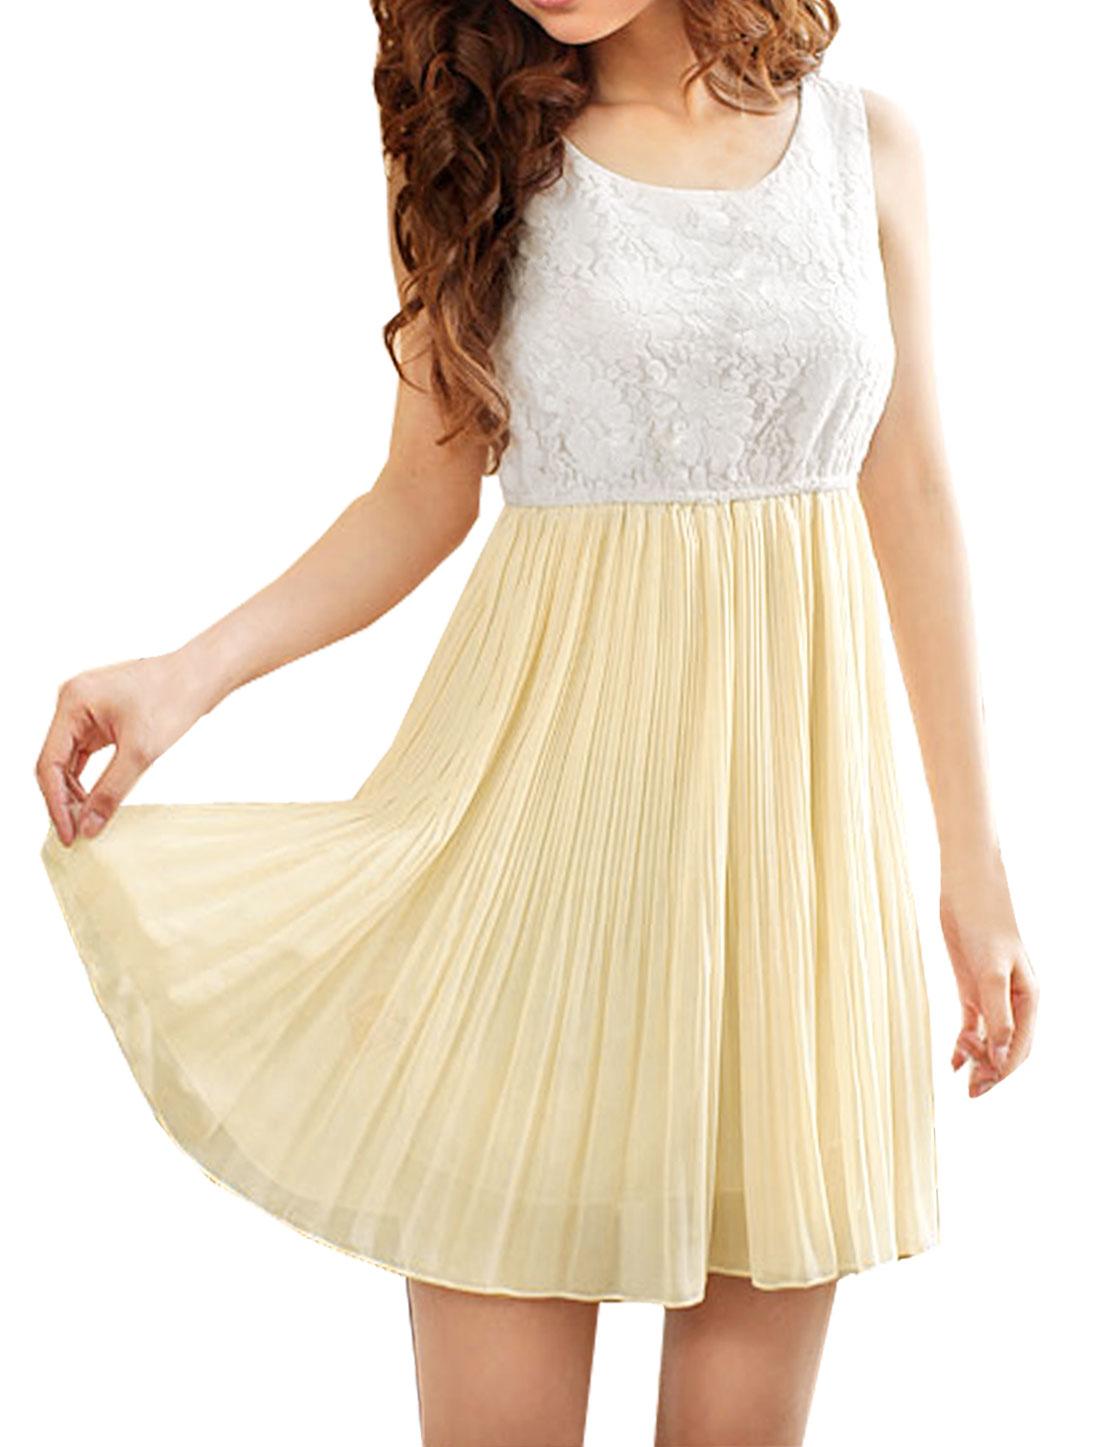 Woman NEW Lace Splice Upper Elastic Waist Beige White A-Line Dress XL